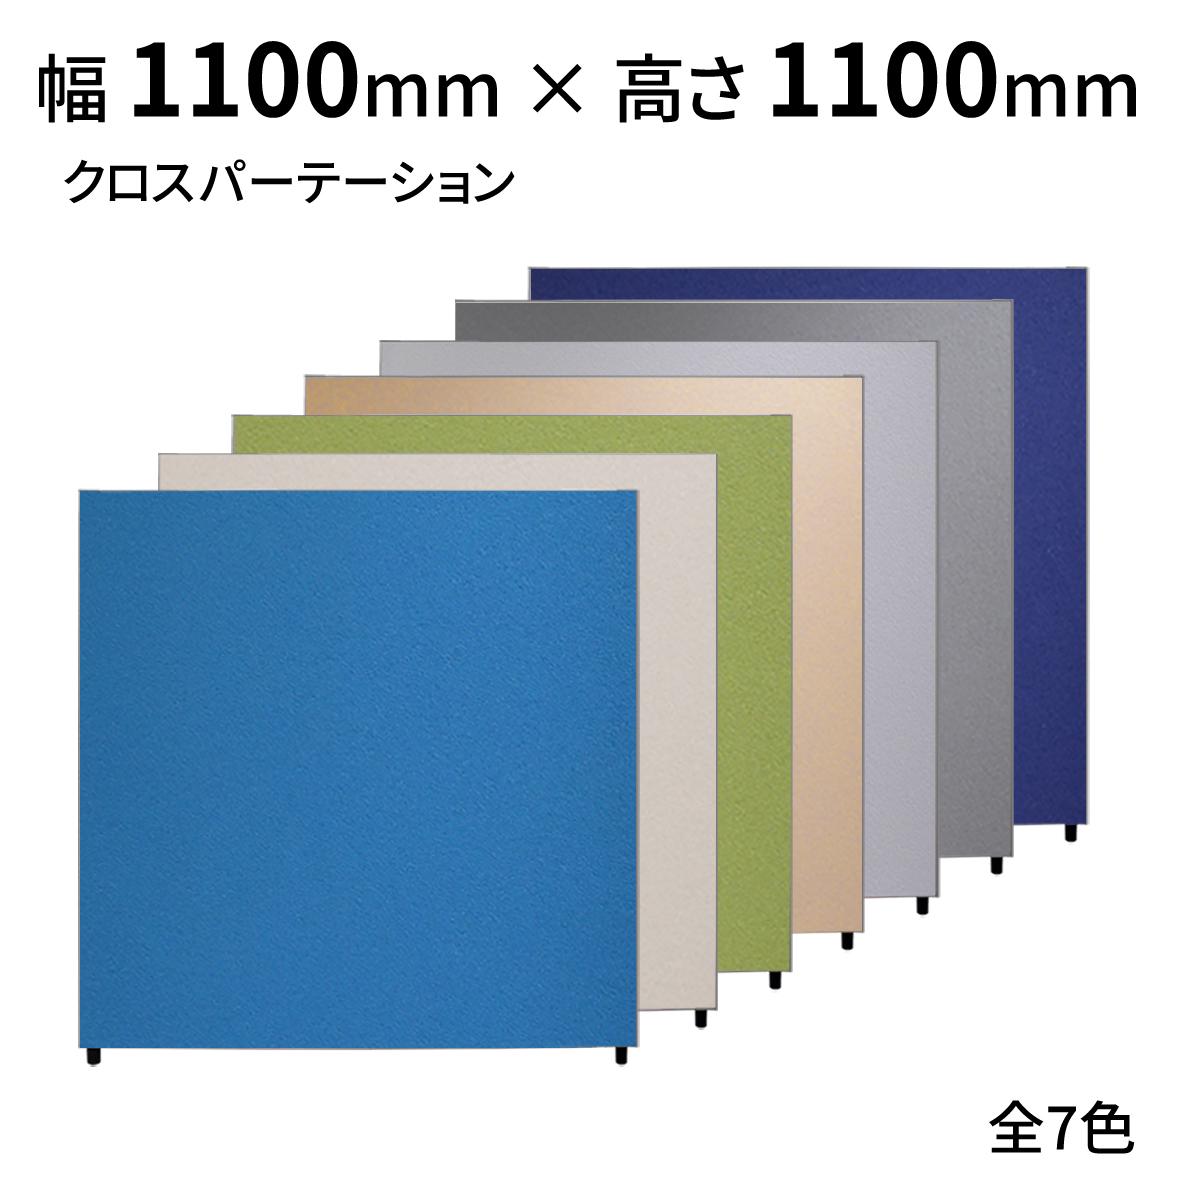 W1100mm×H1100mm日本製クロスパーテーション ローパーテーション 法人限定 オフィスパーテーション 間仕切り 衝立 両側用安定脚(低床タイプ)1個付き